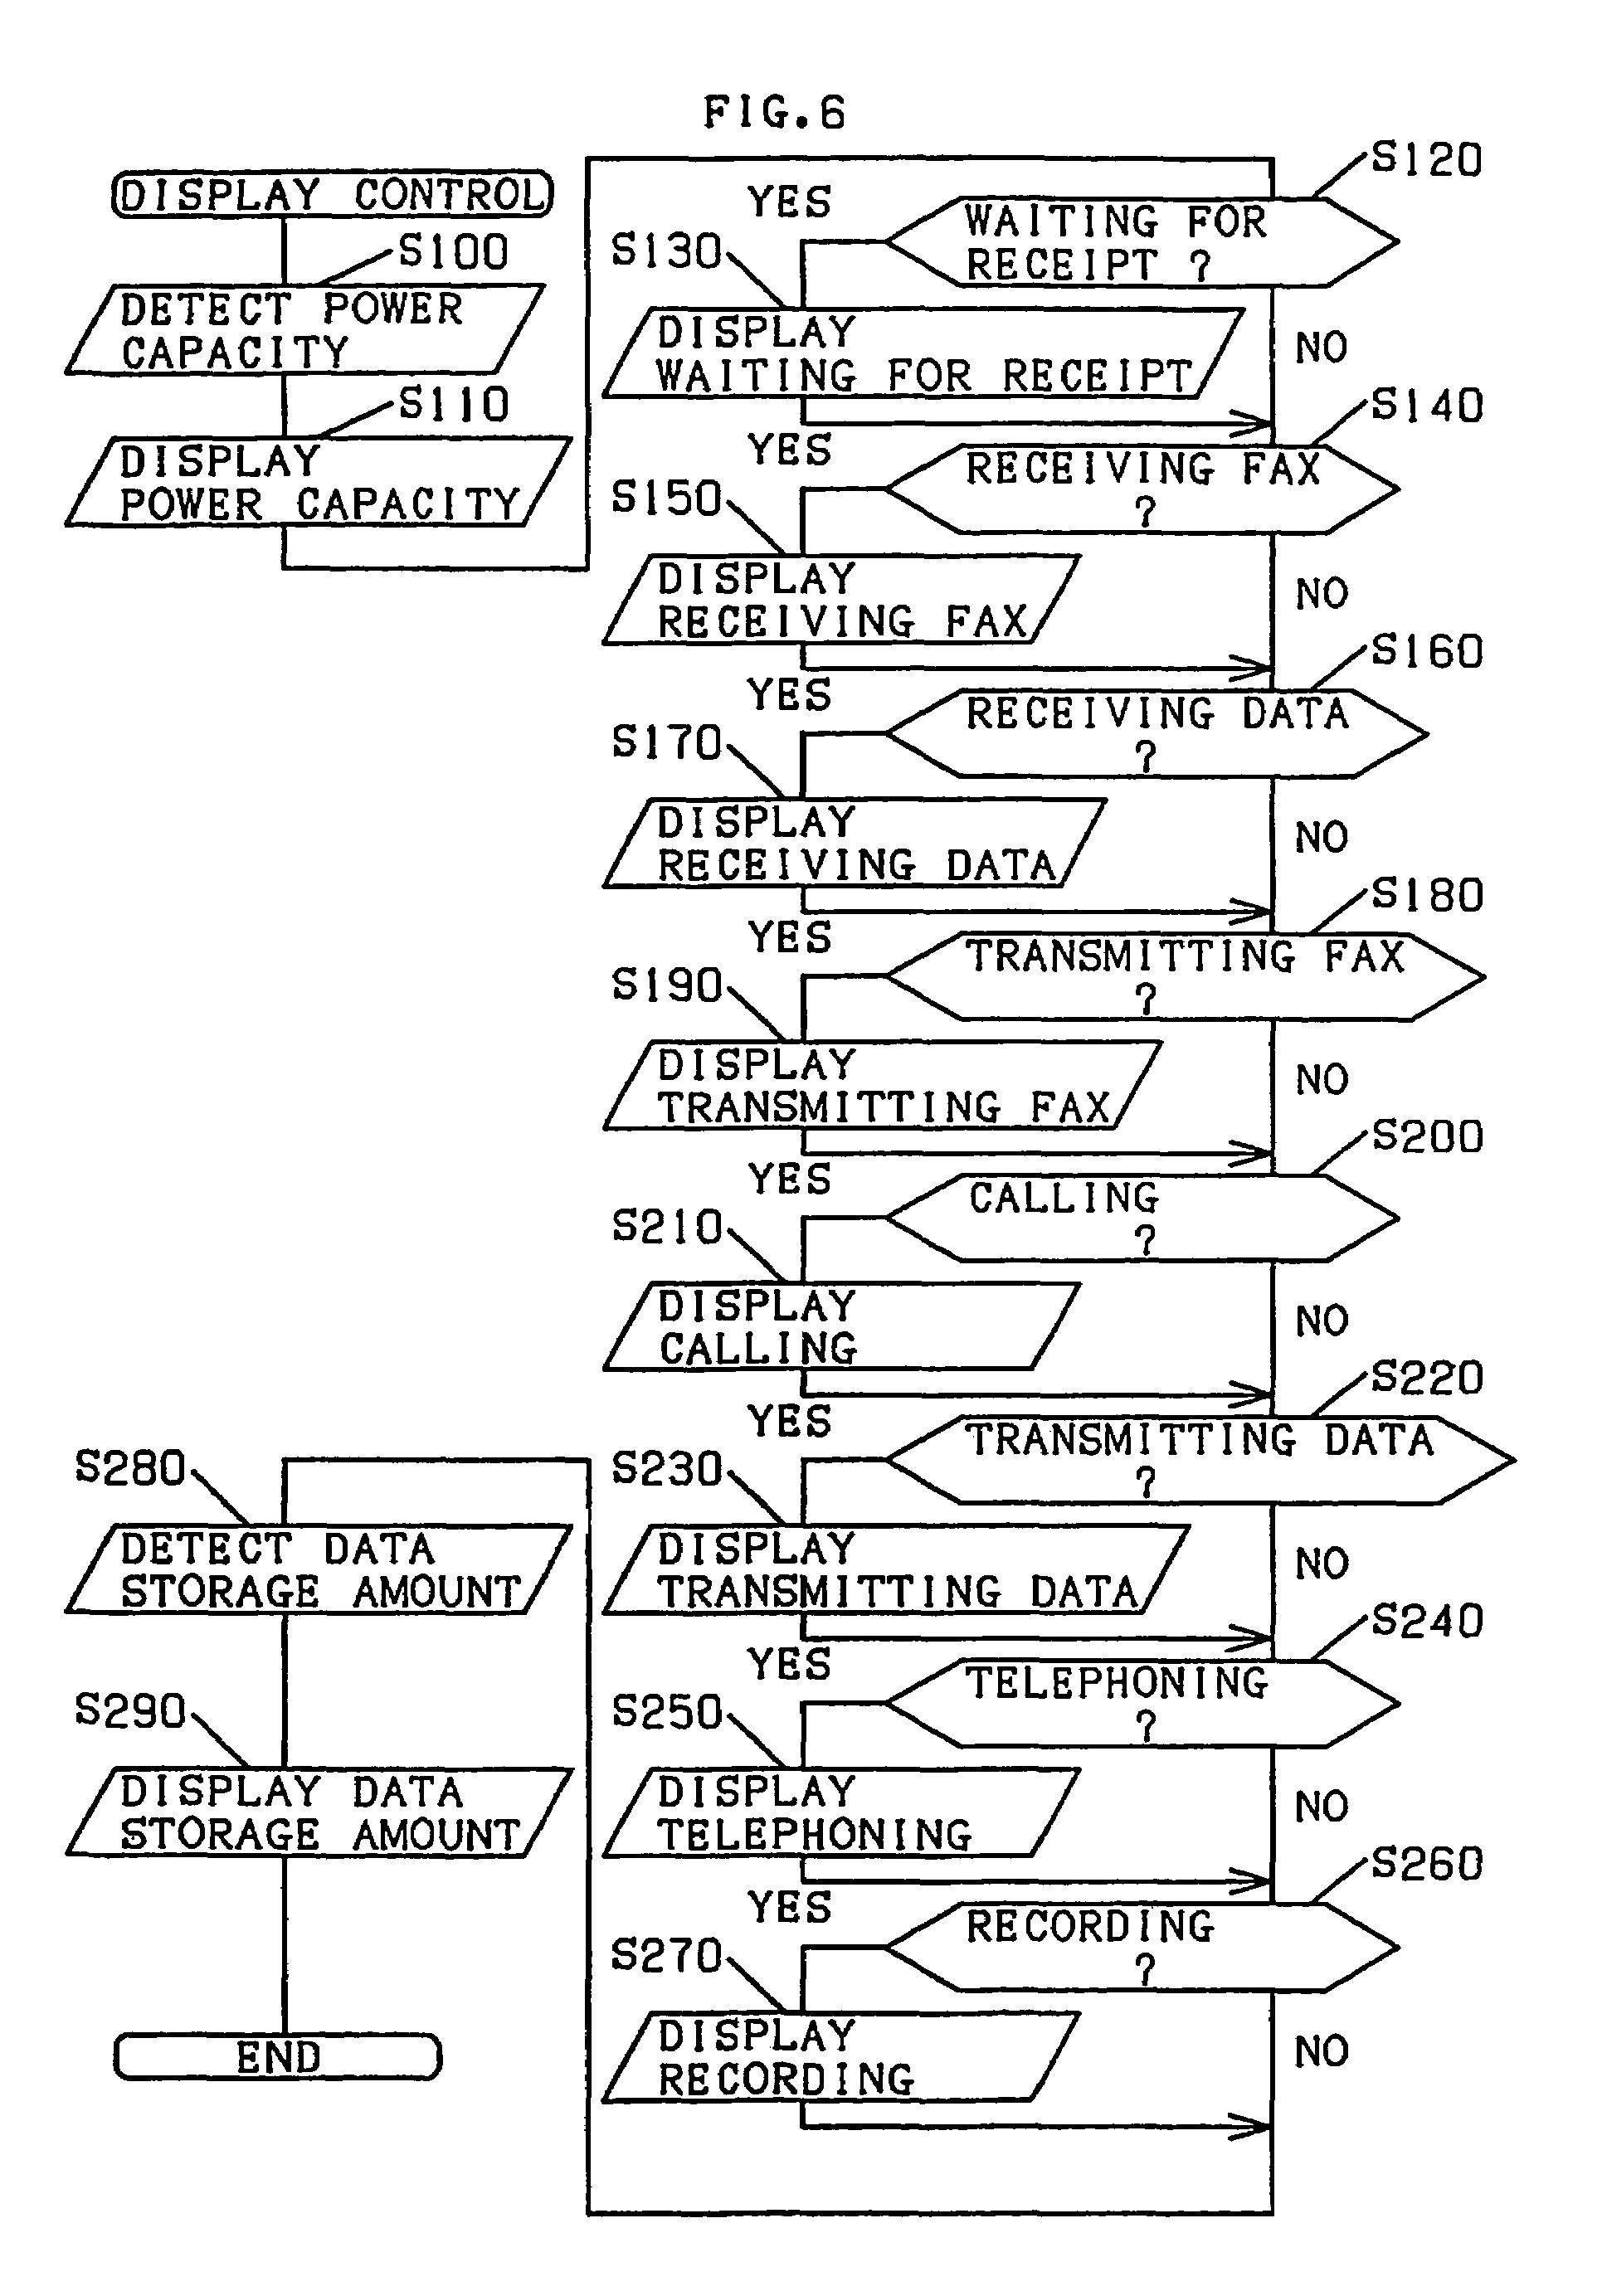 Patent US 7,567,361 B2